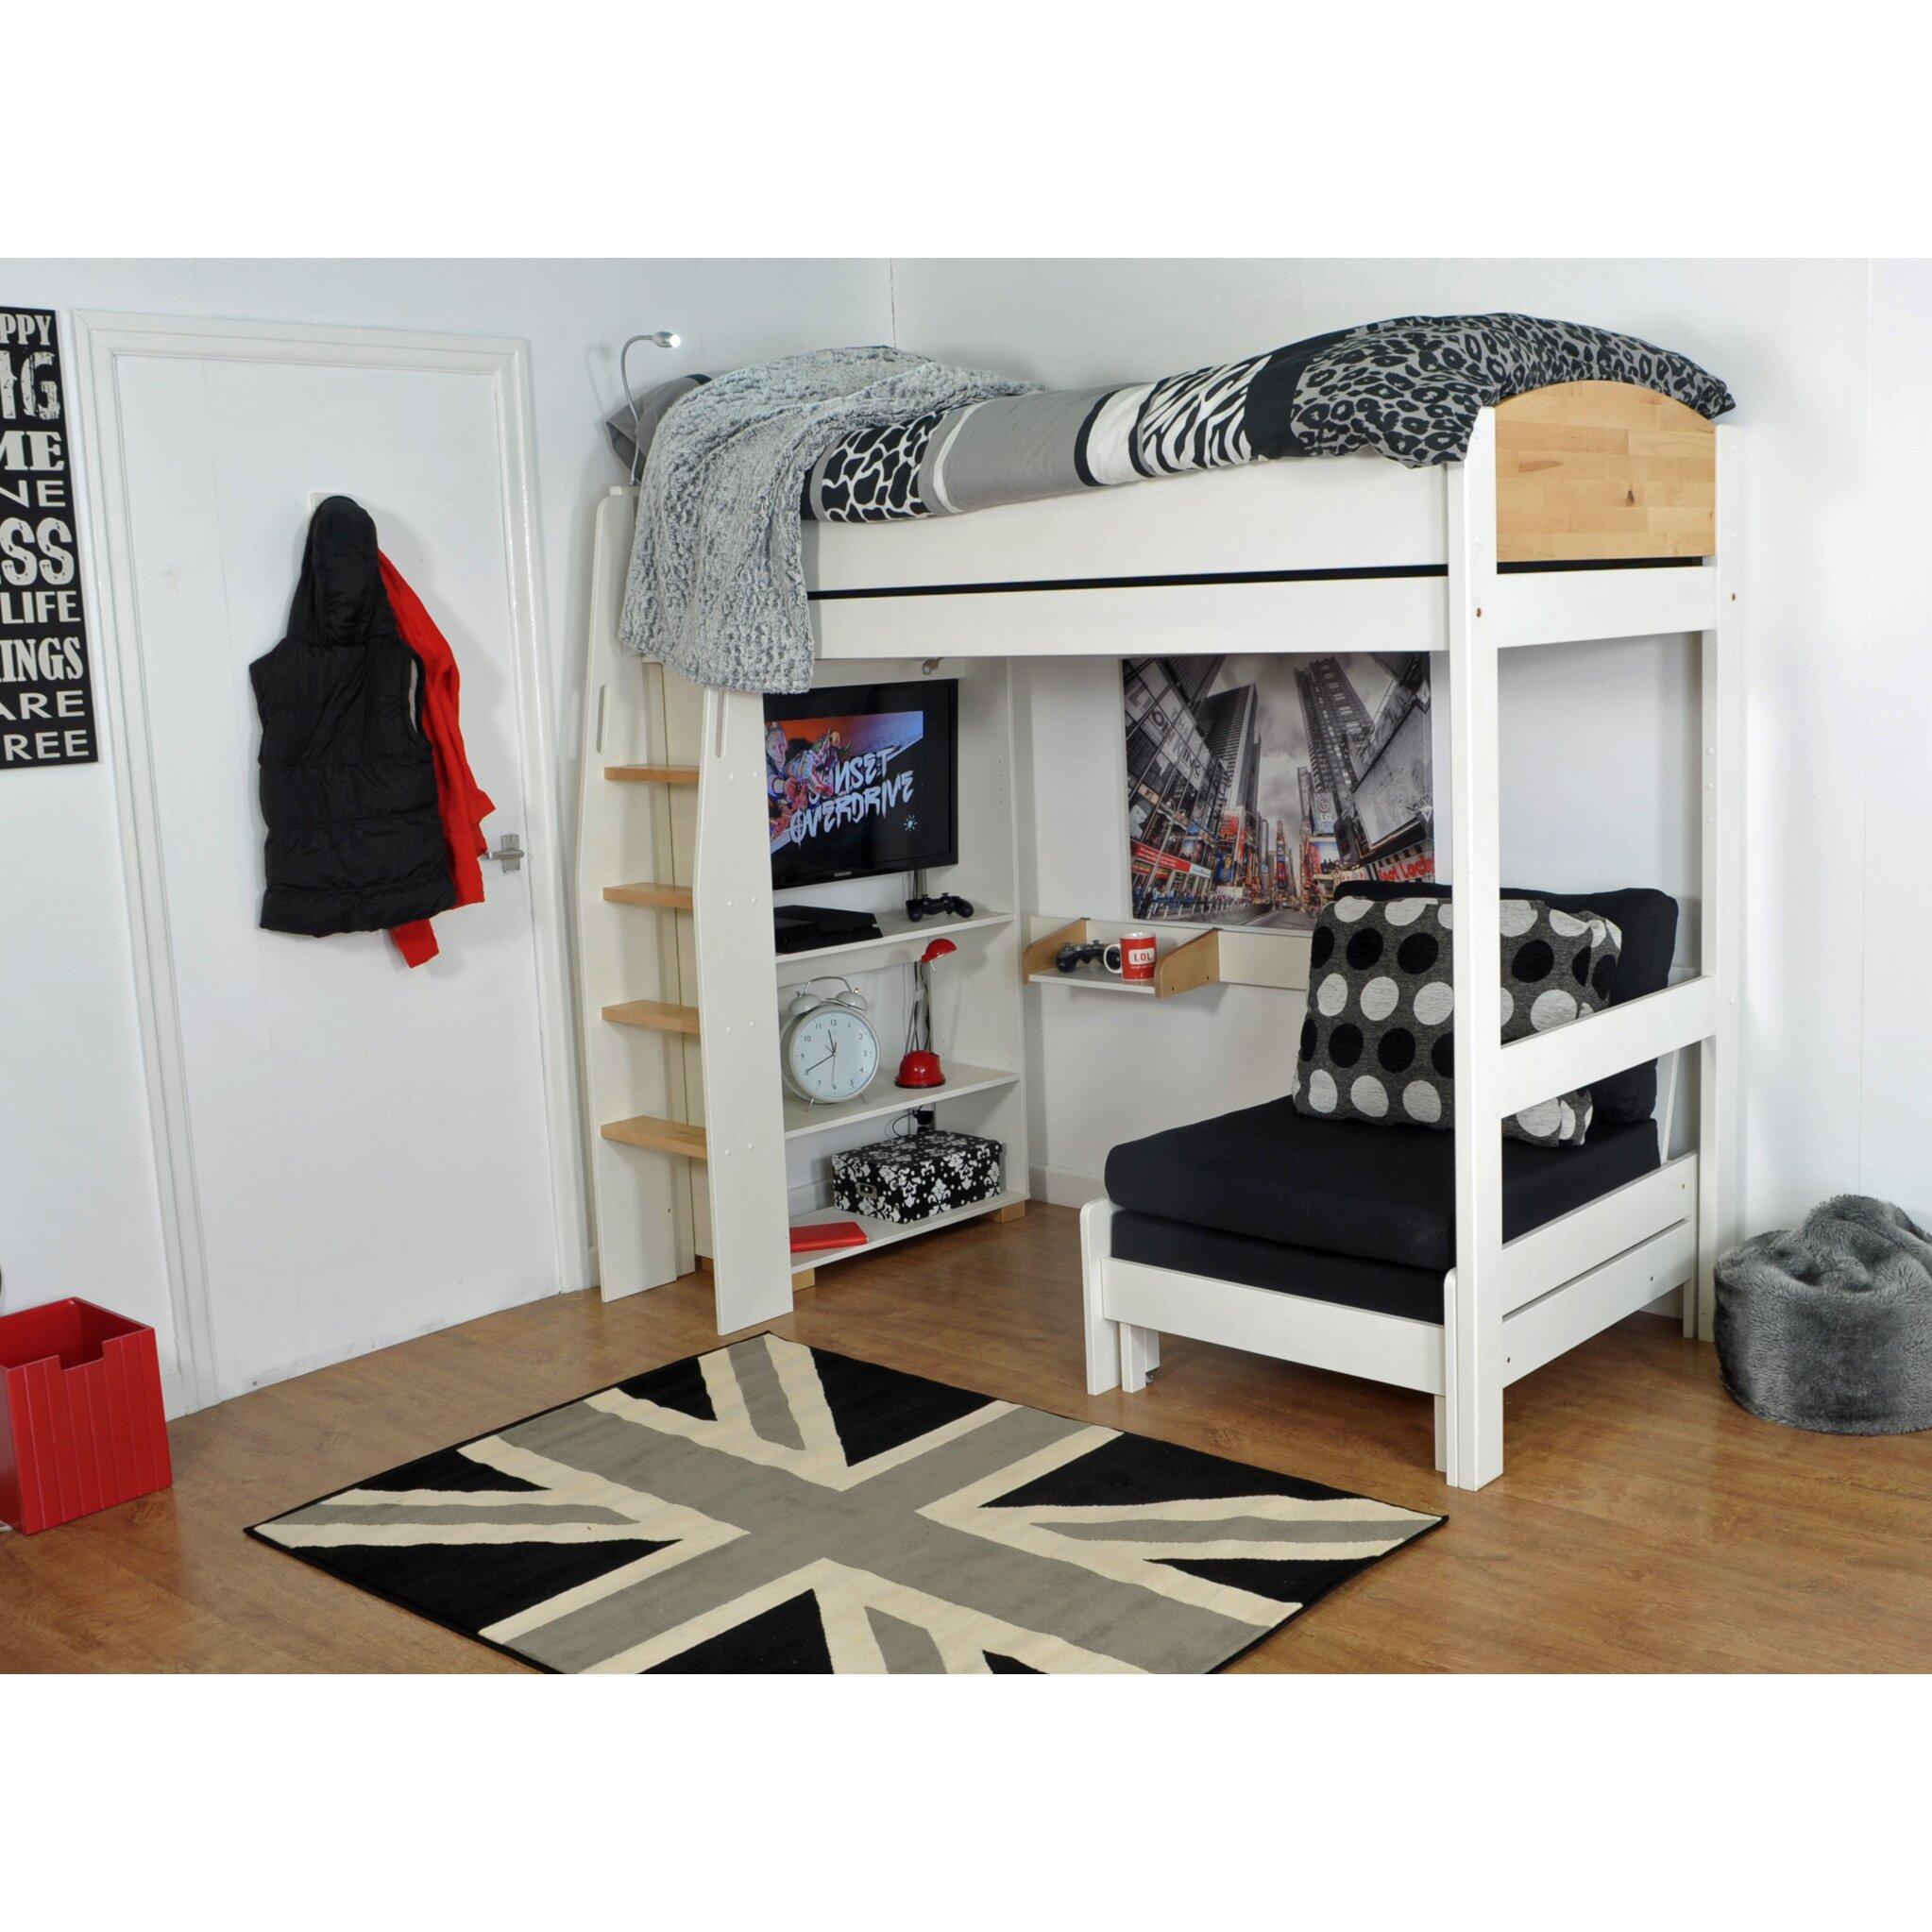 Wrigglebox Norfolk Single High Sleeper Bed | Wayfair UK